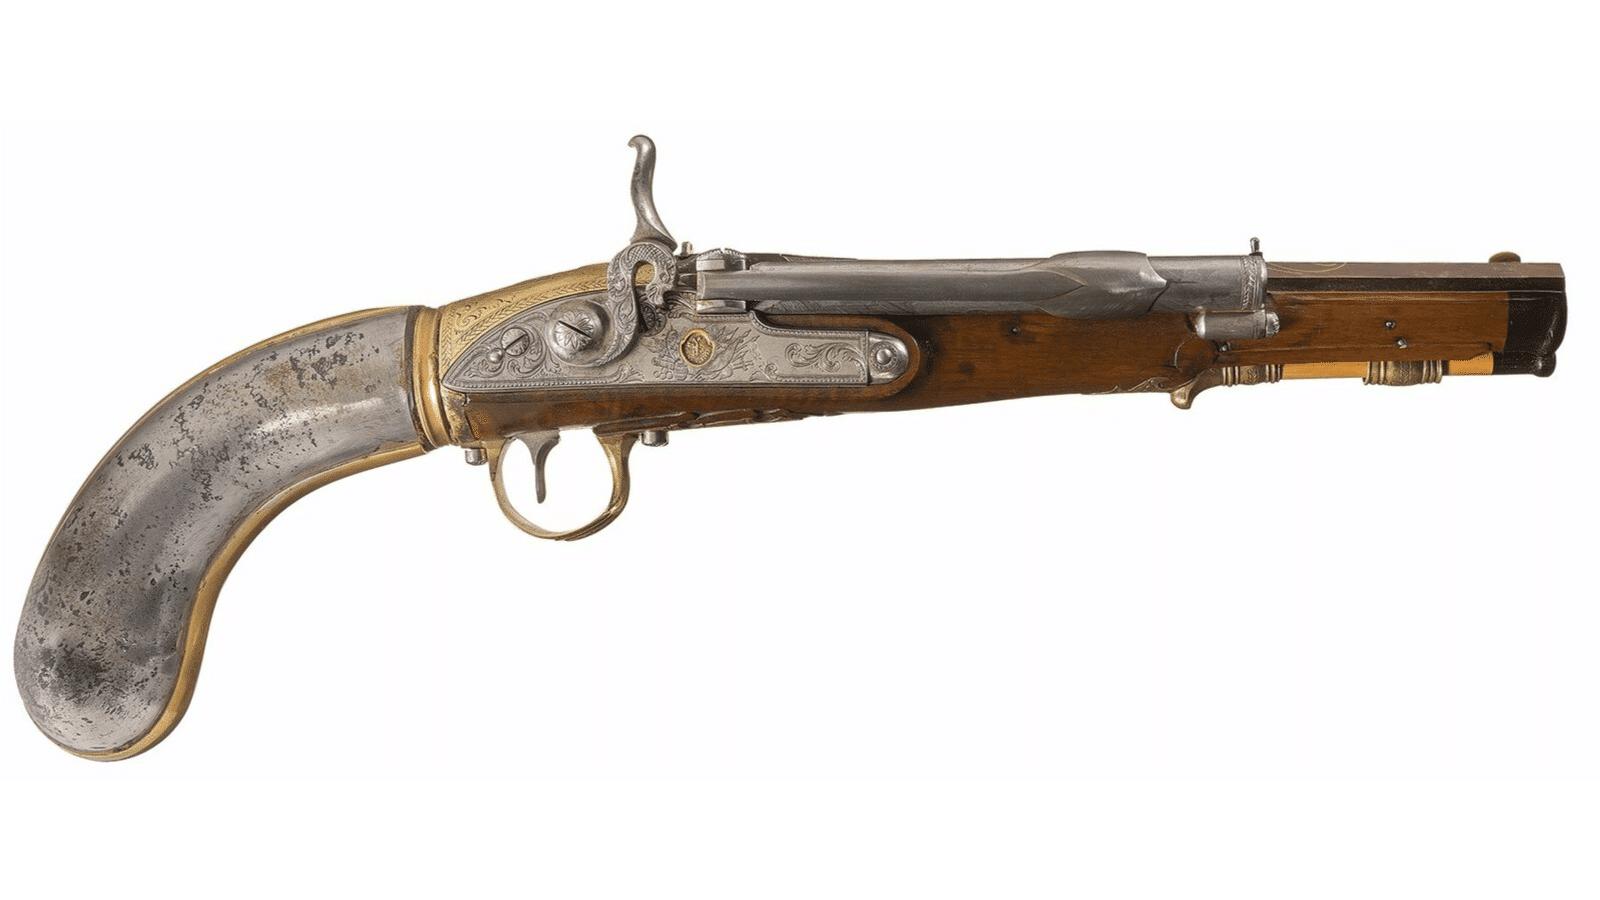 primeira-pistola-girandoni-de-pressao-ar-historia-airgun-3